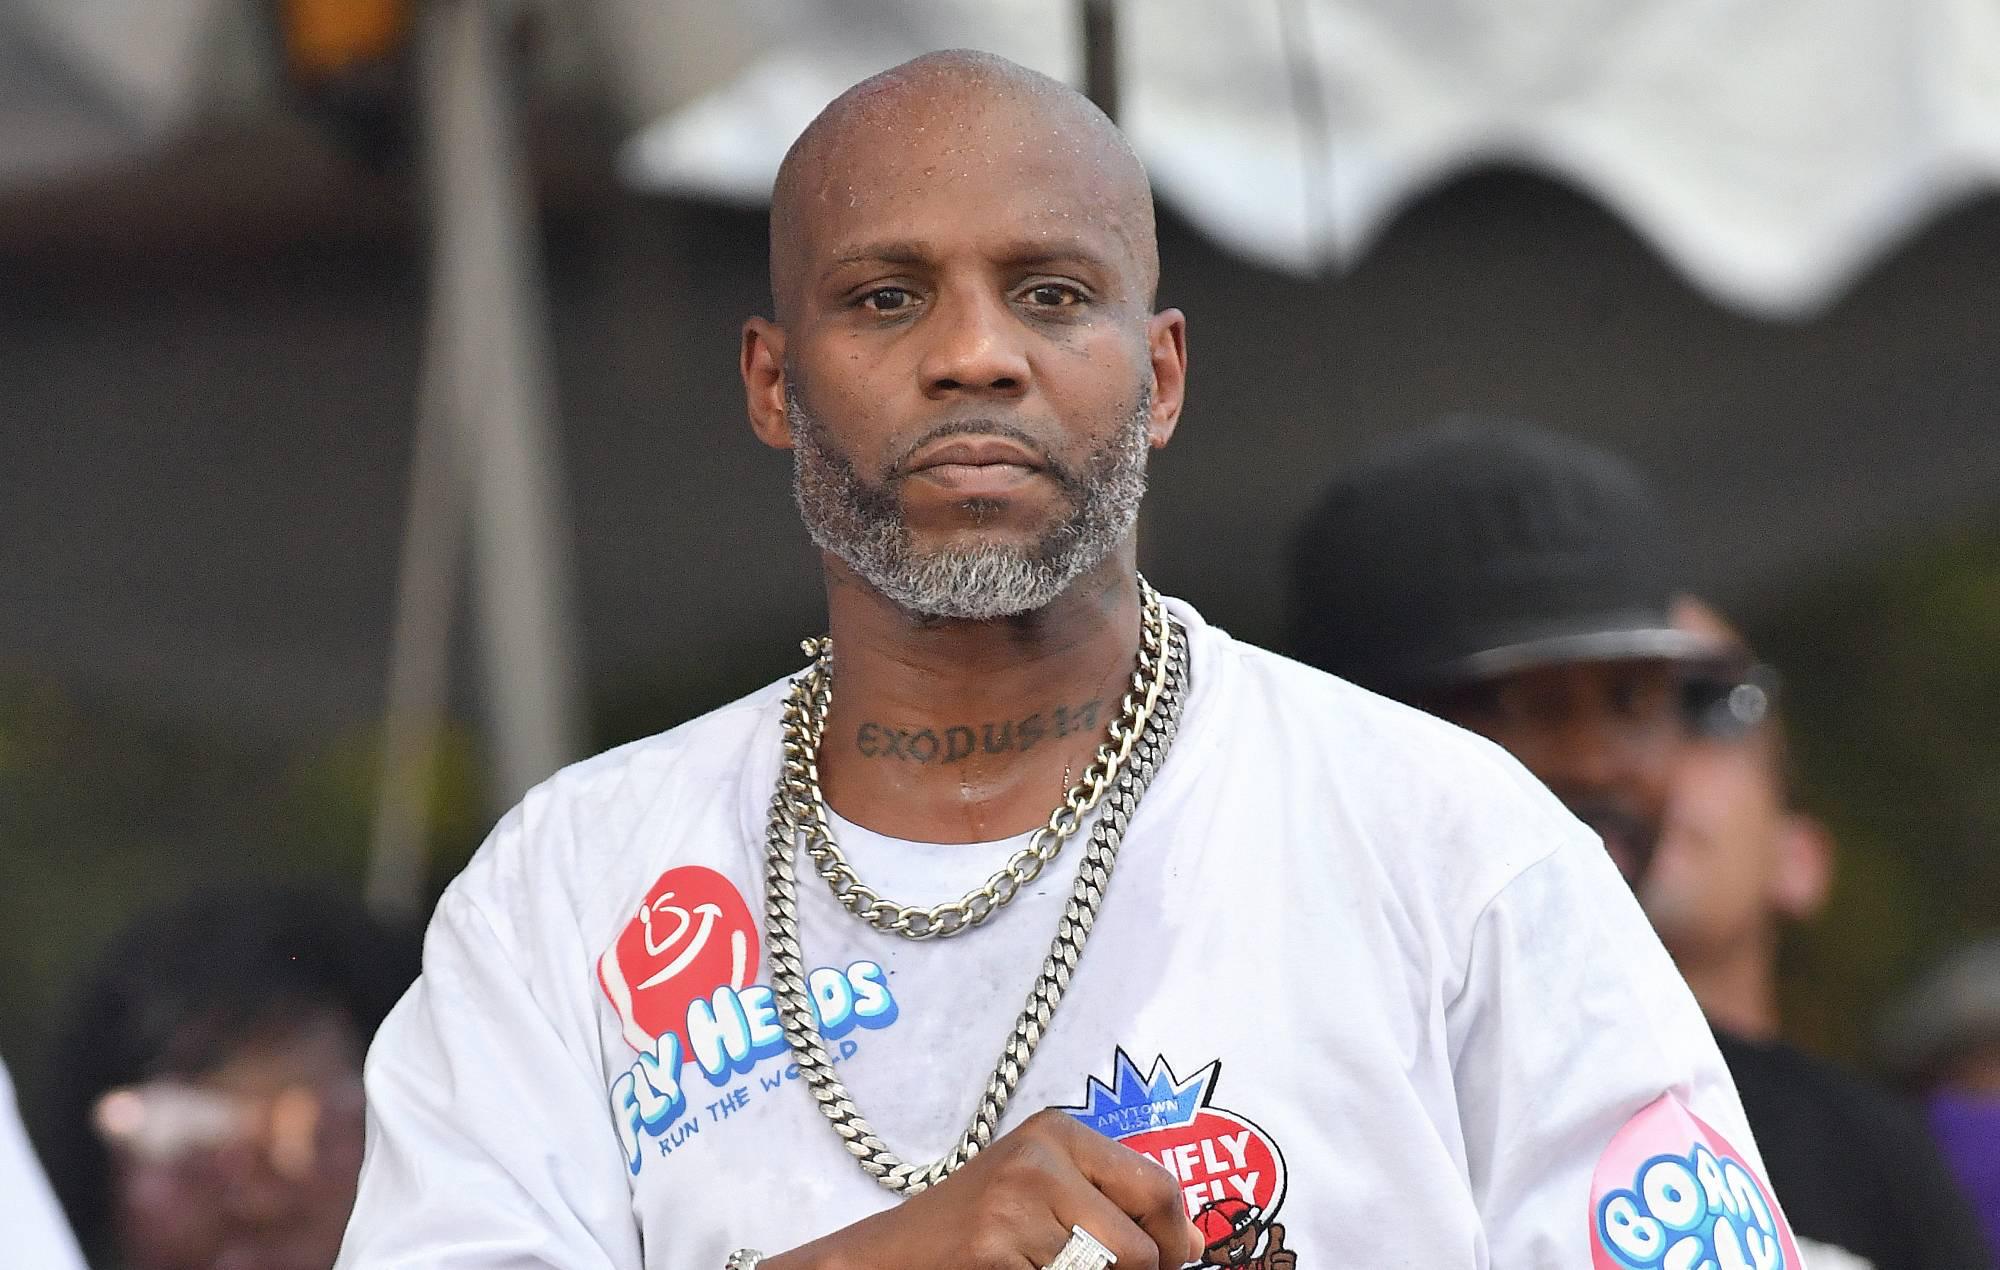 Legendary Hip-Hop Artist and Actor DMX Has Died